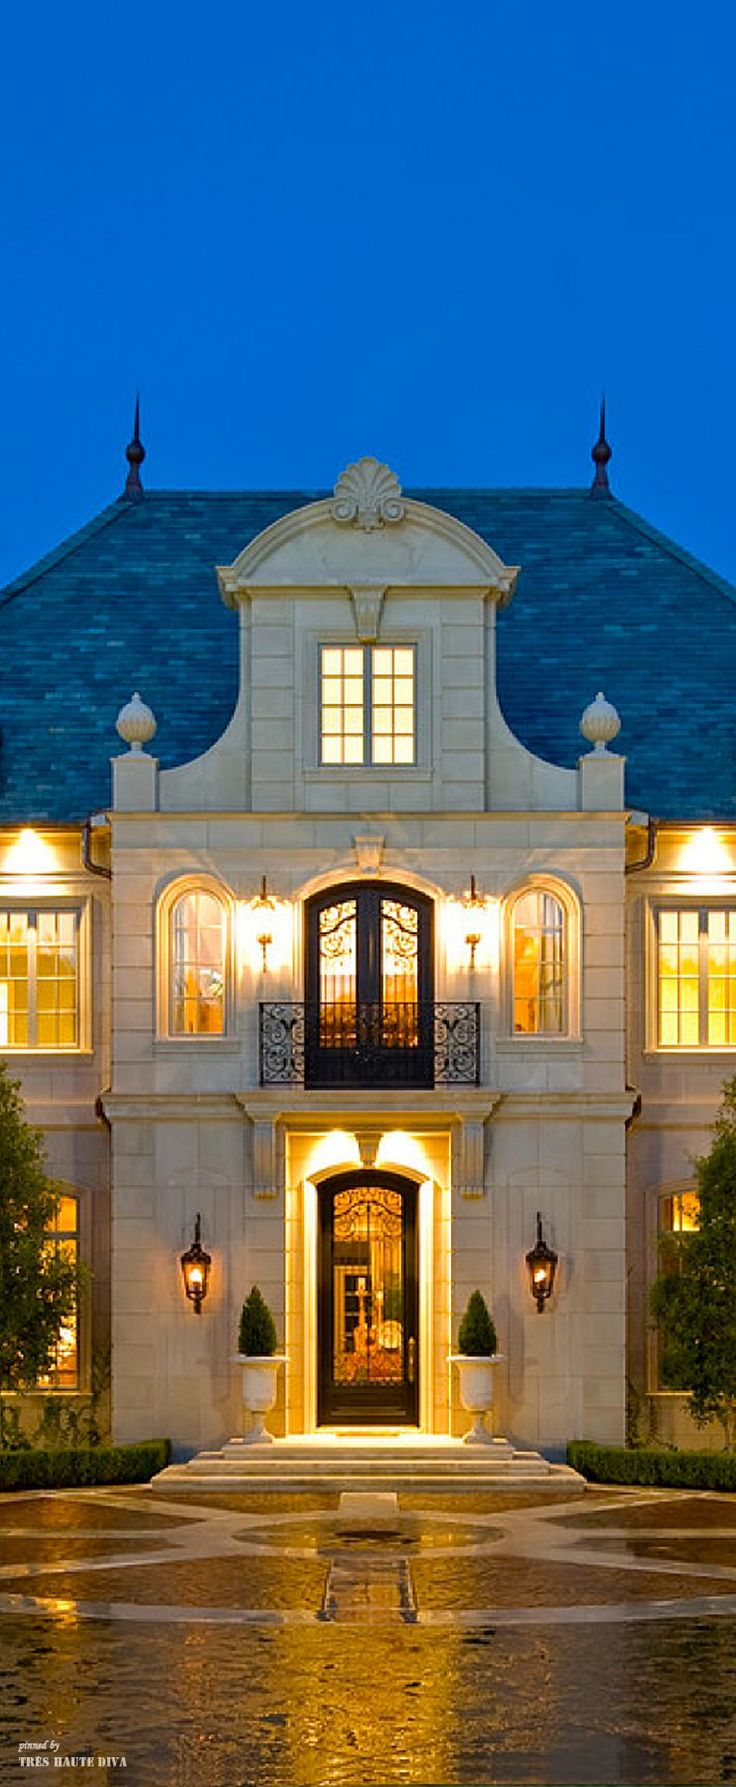 The Chateau Billion DOLLAR 39 Babe Casa De Crazy Dream Home Pint